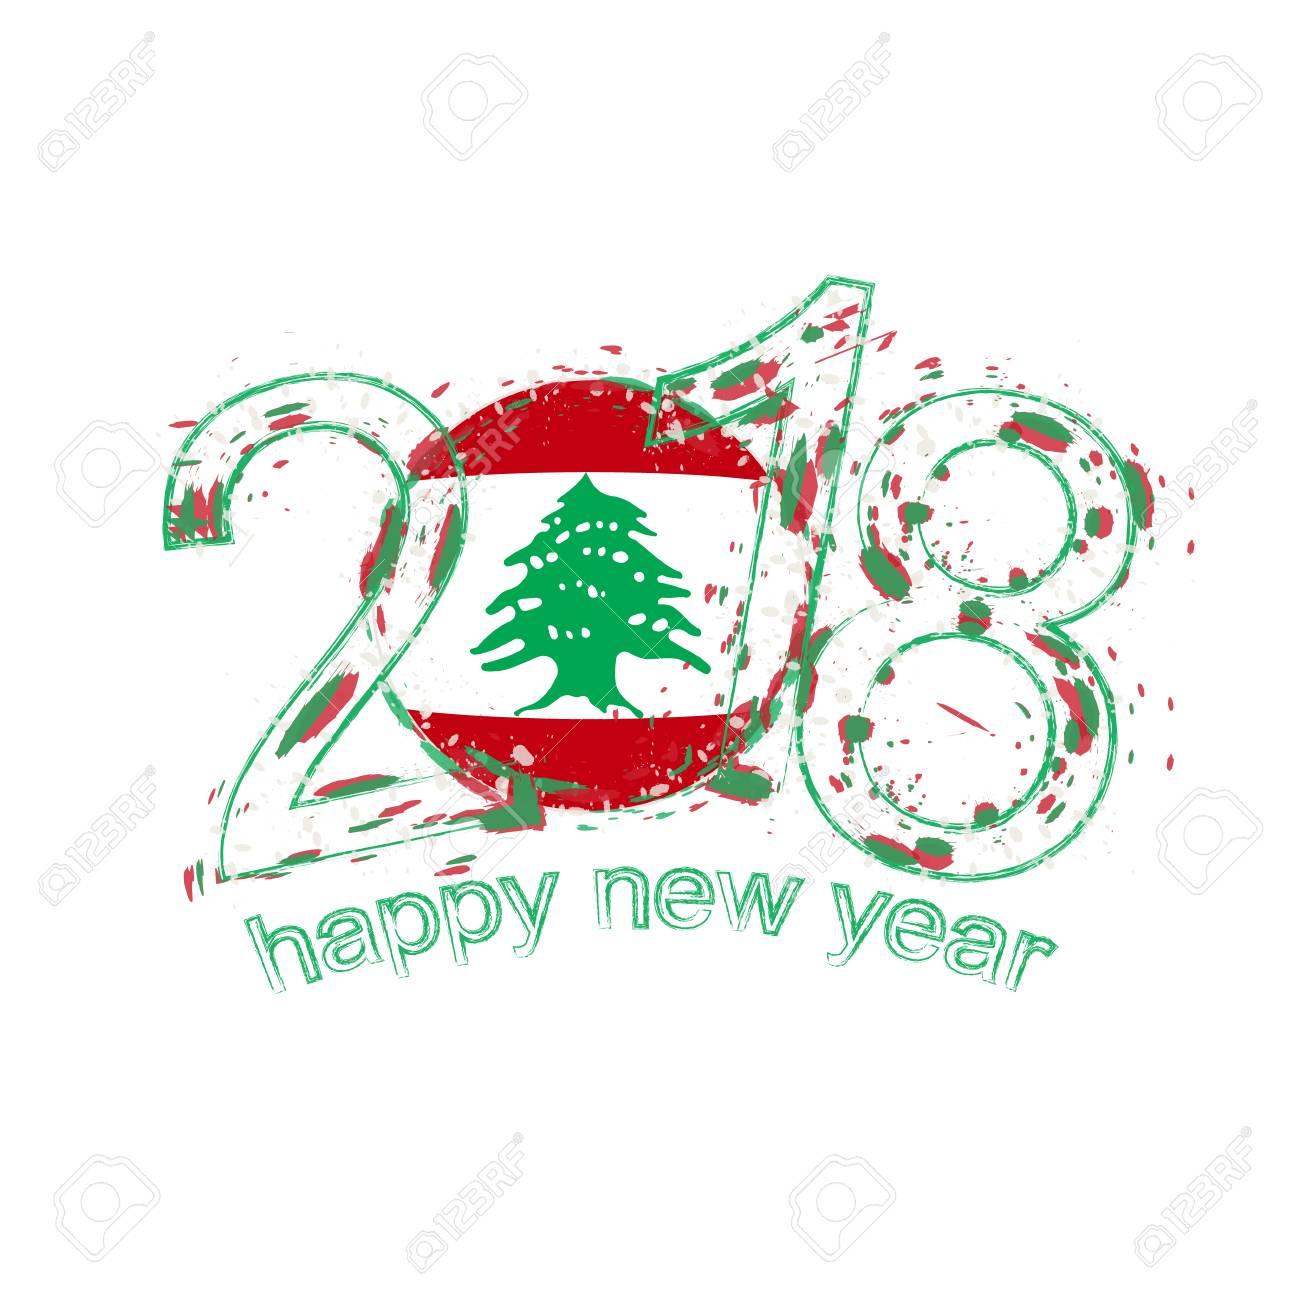 2018 happy new year lebanon grunge vector template for greeting card calendars 2018 seasonal